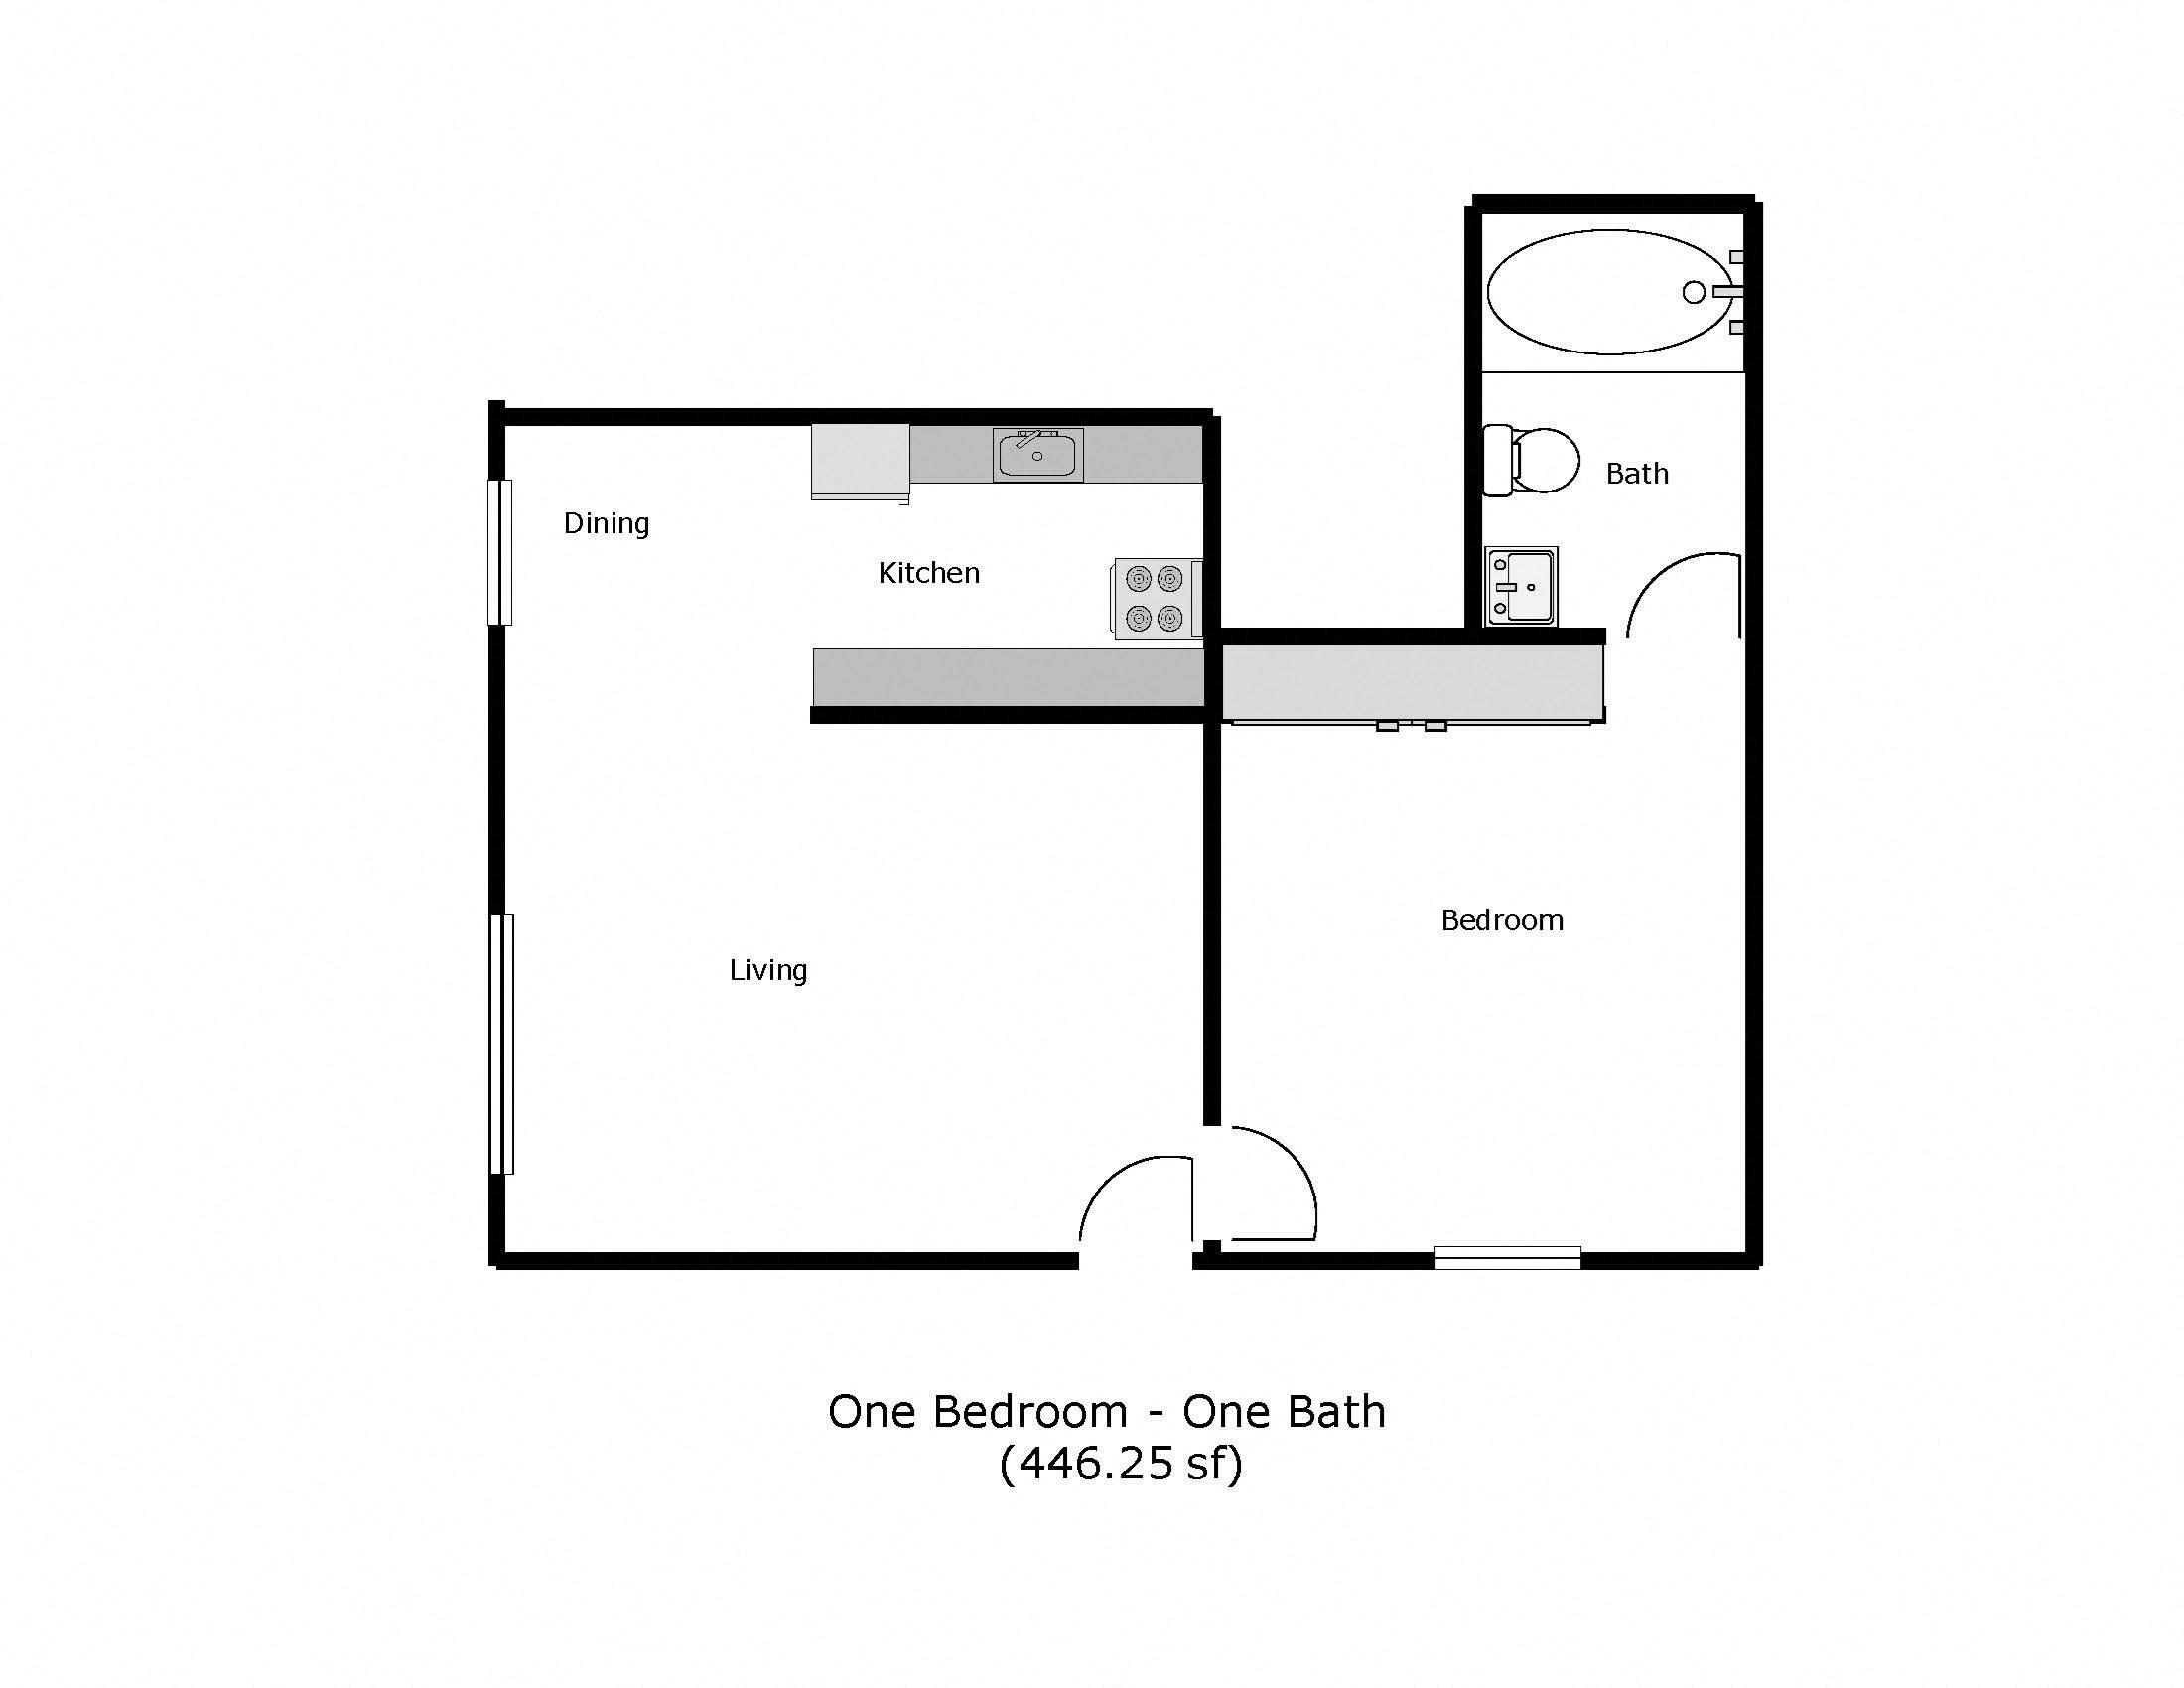 Marpel - Carpenter/Washington Street, Fairfield - 1 Bed 1 Bath Floor Plan 4